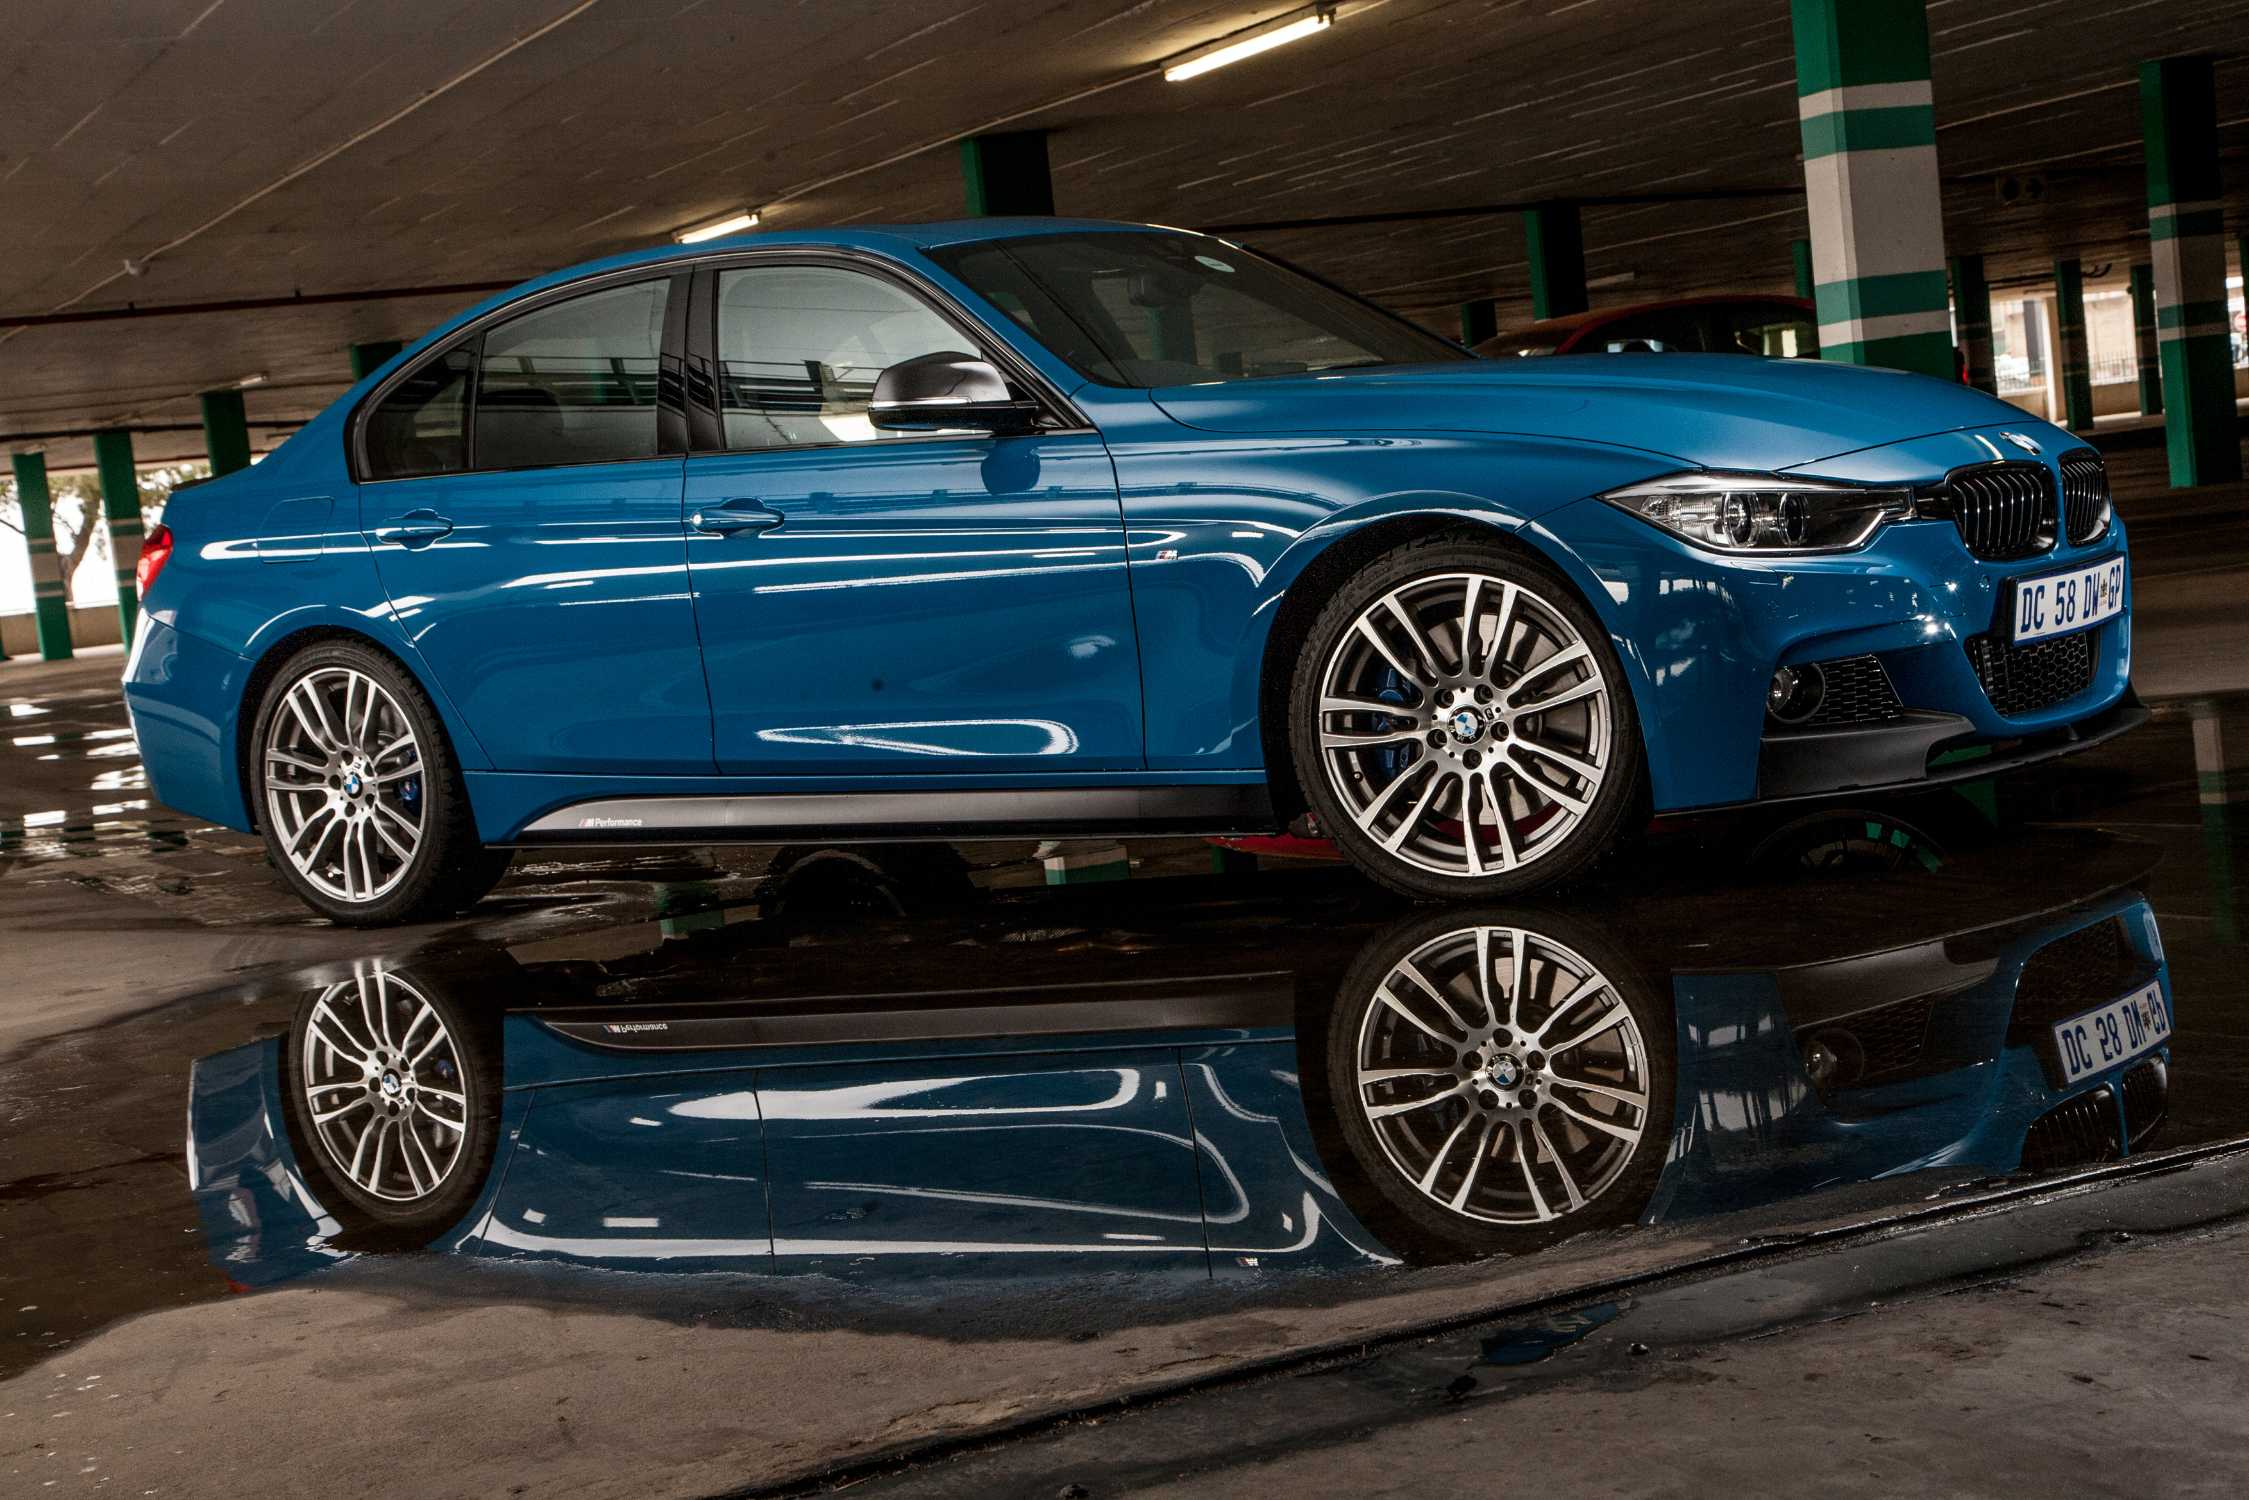 The New Bmw 3 Series Sedan M Performance Edition